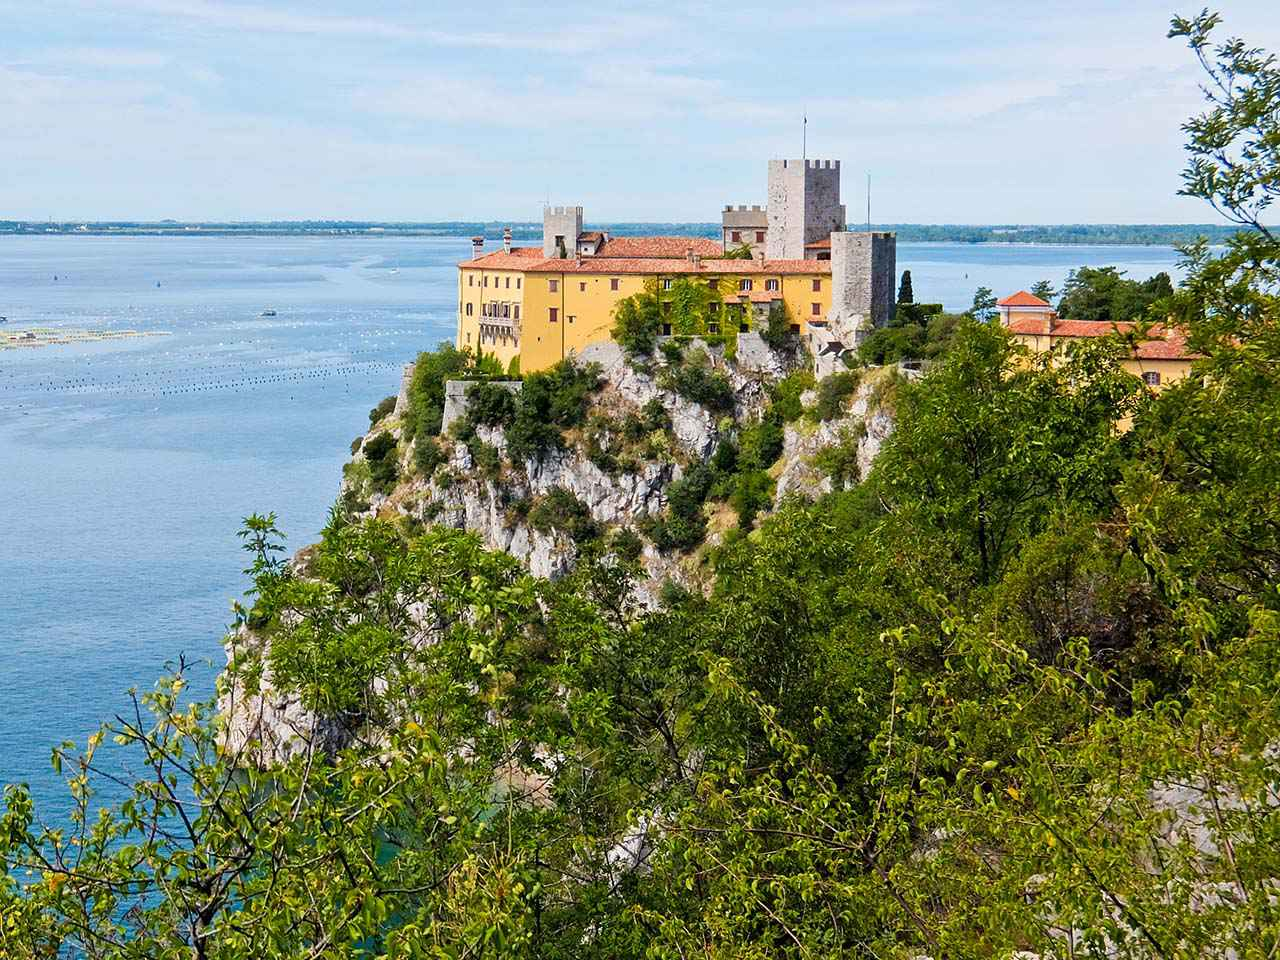 Duino Castle, Italy